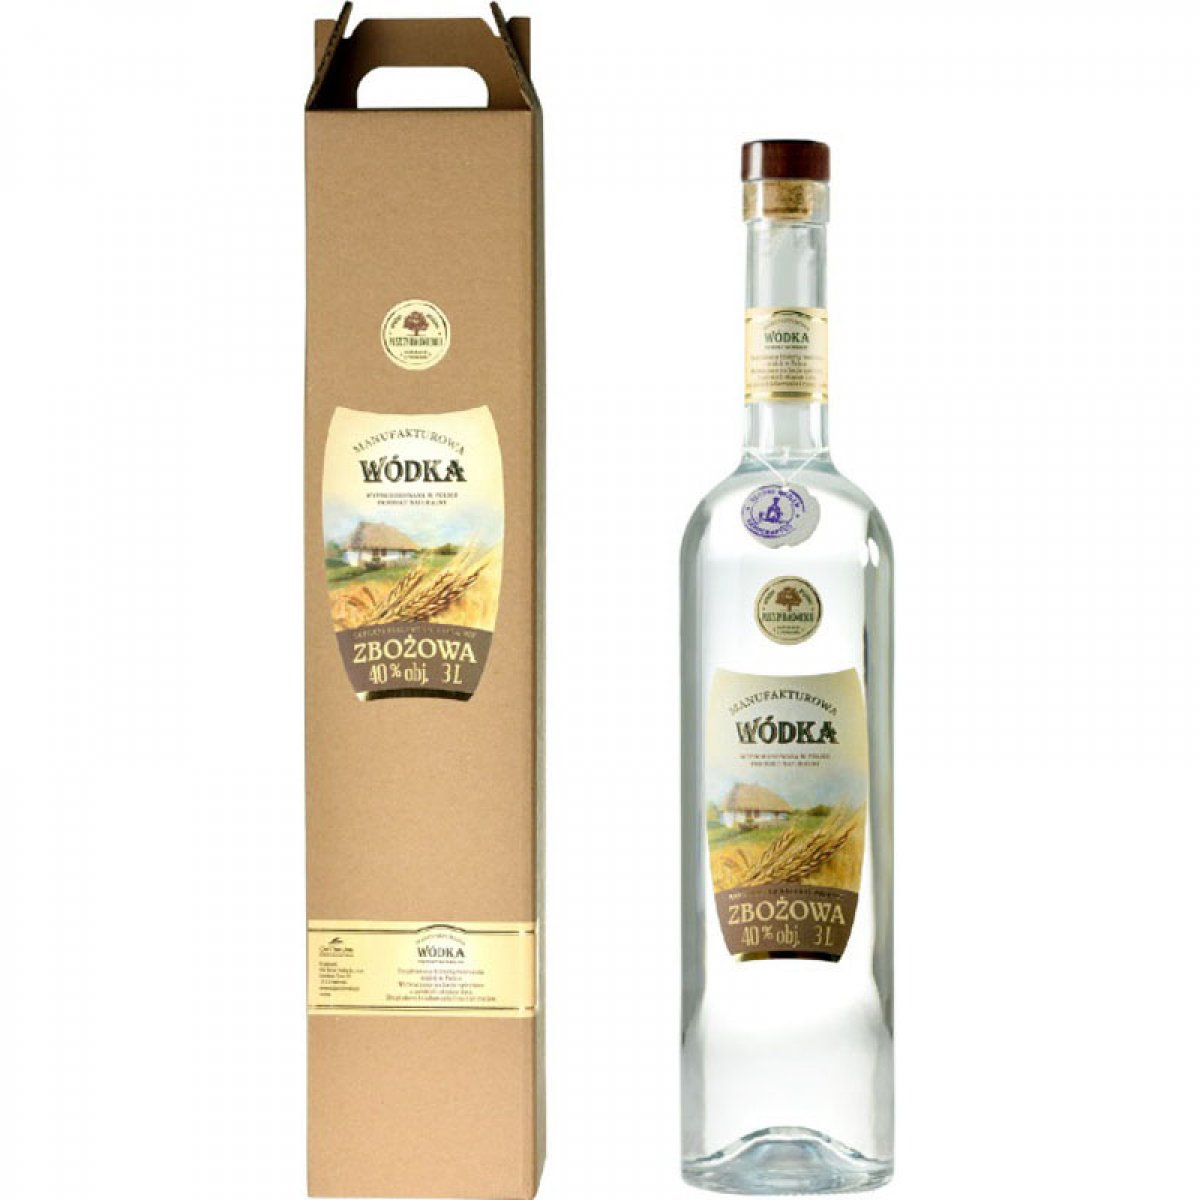 wodka-manufakturowa-zbozowa-3L